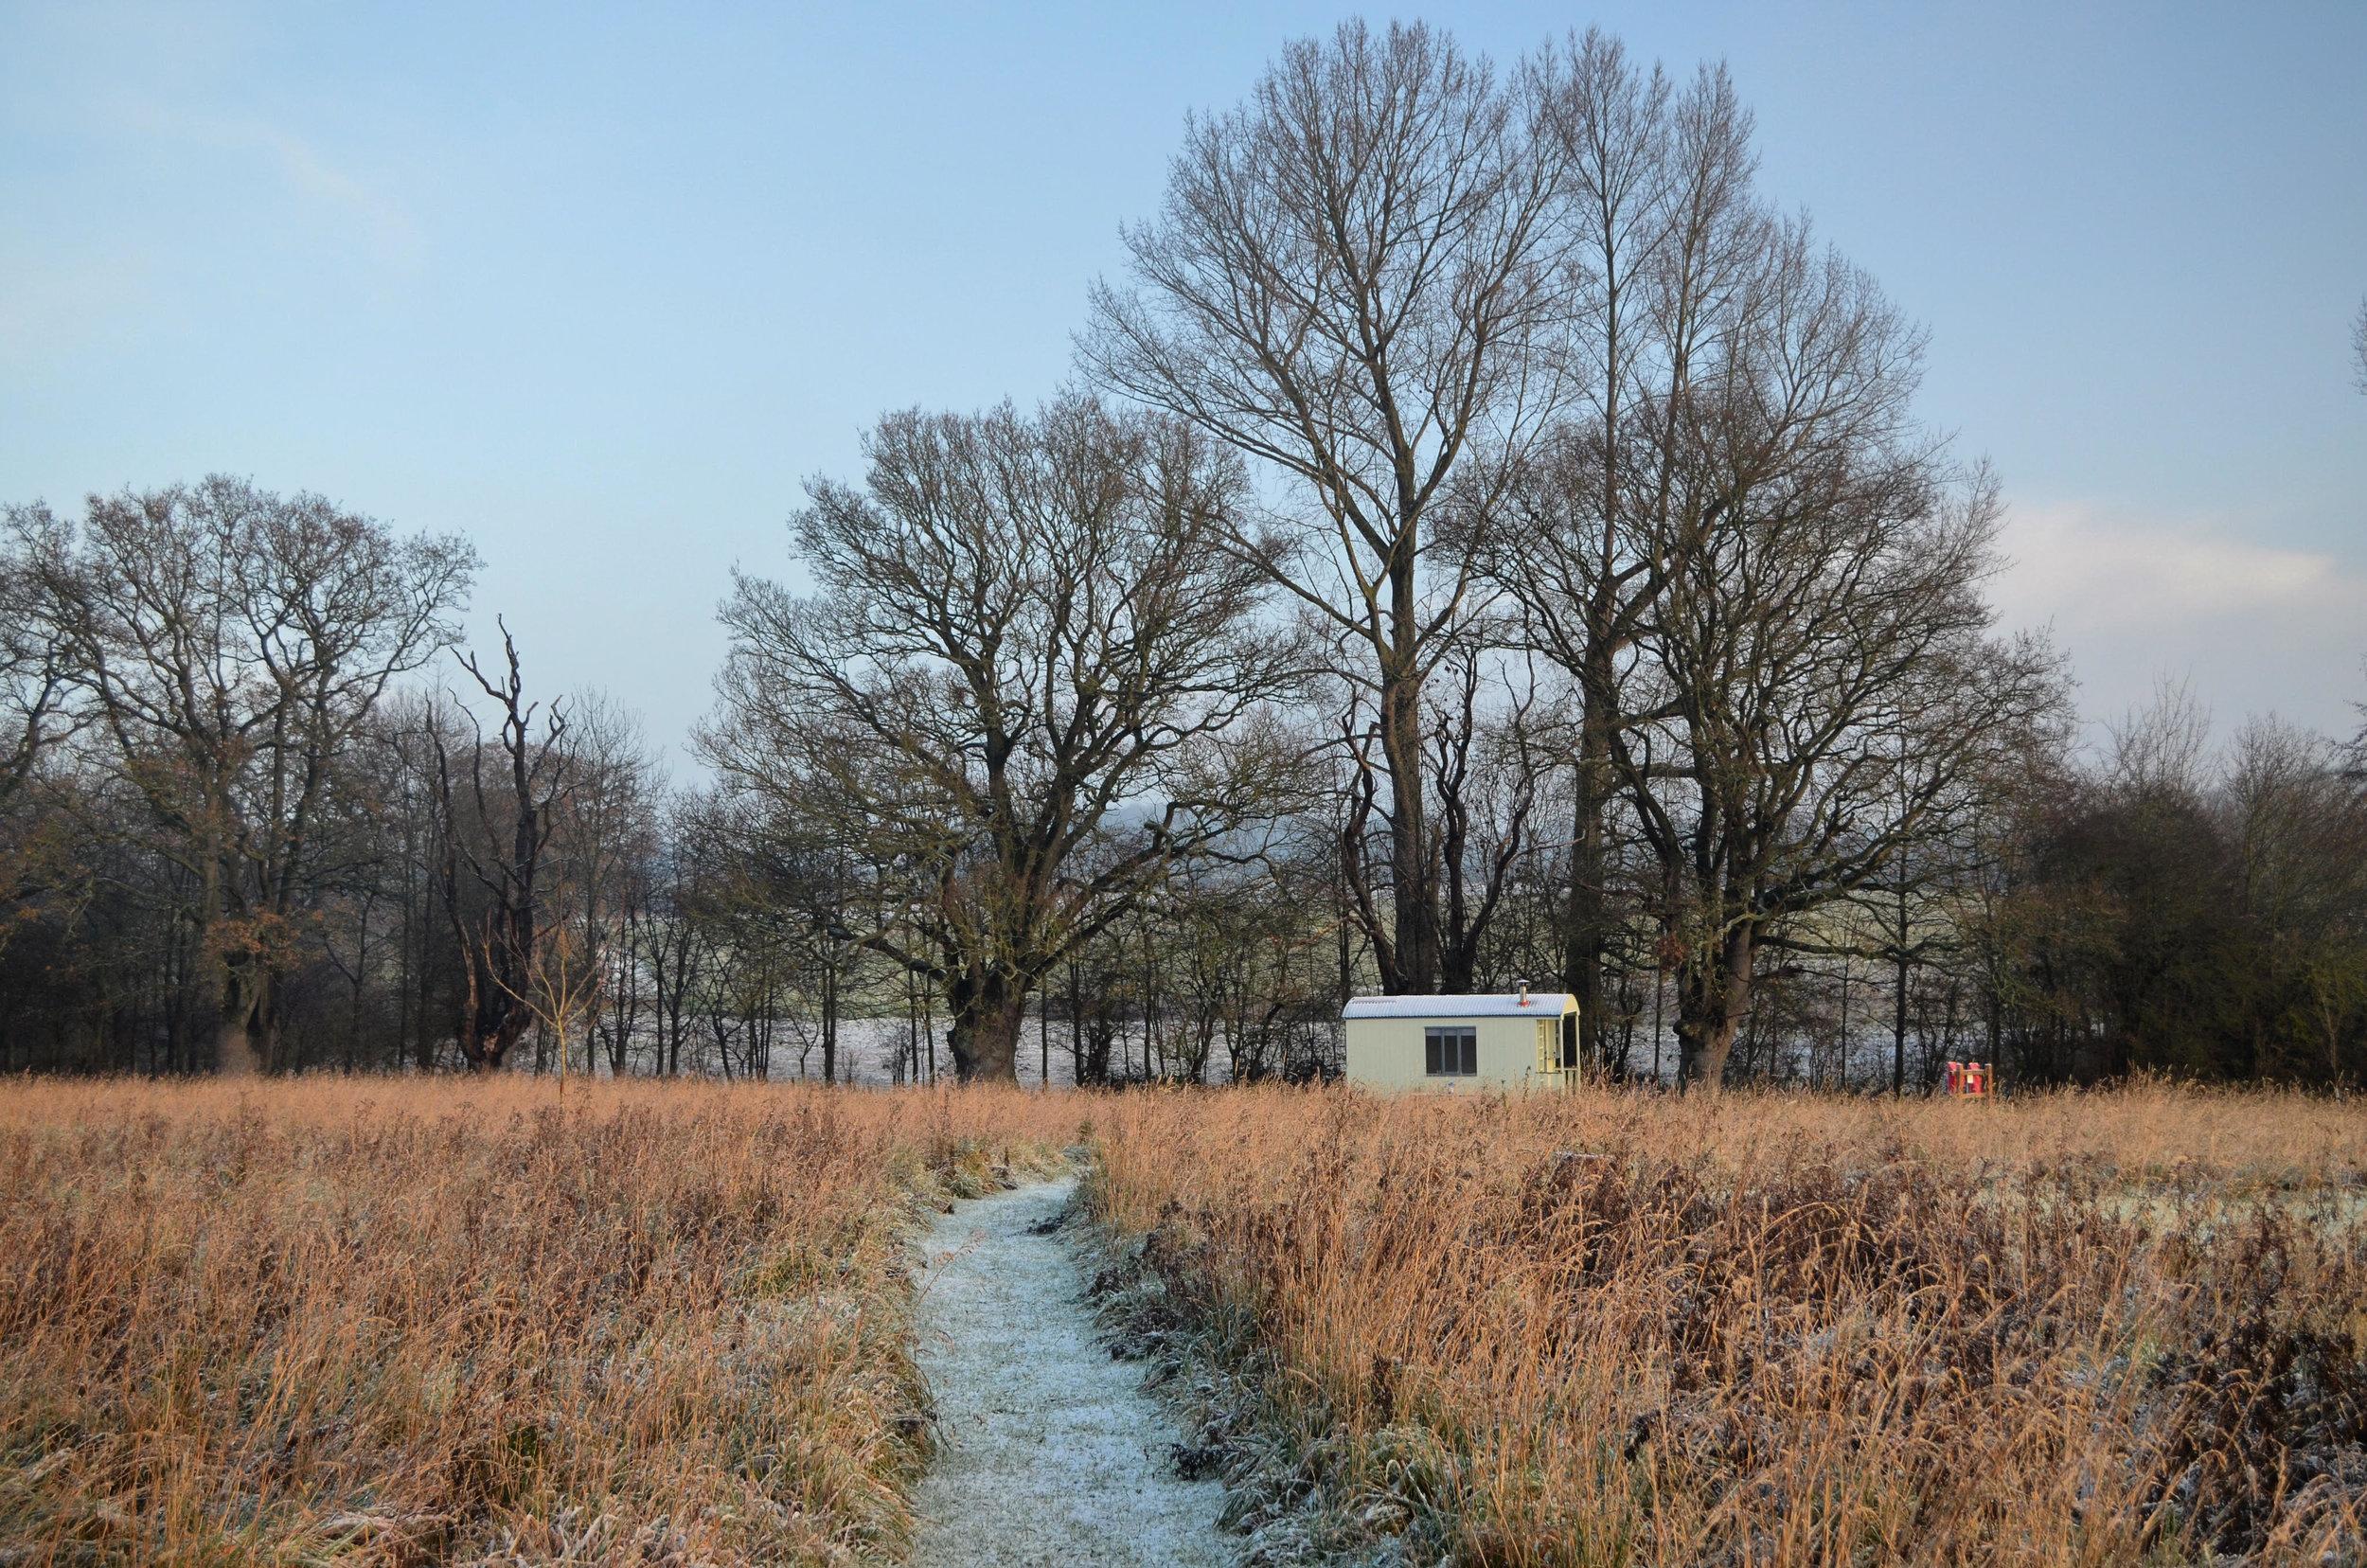 Wardley Hill Campsite - - Wardley Hill Campsite